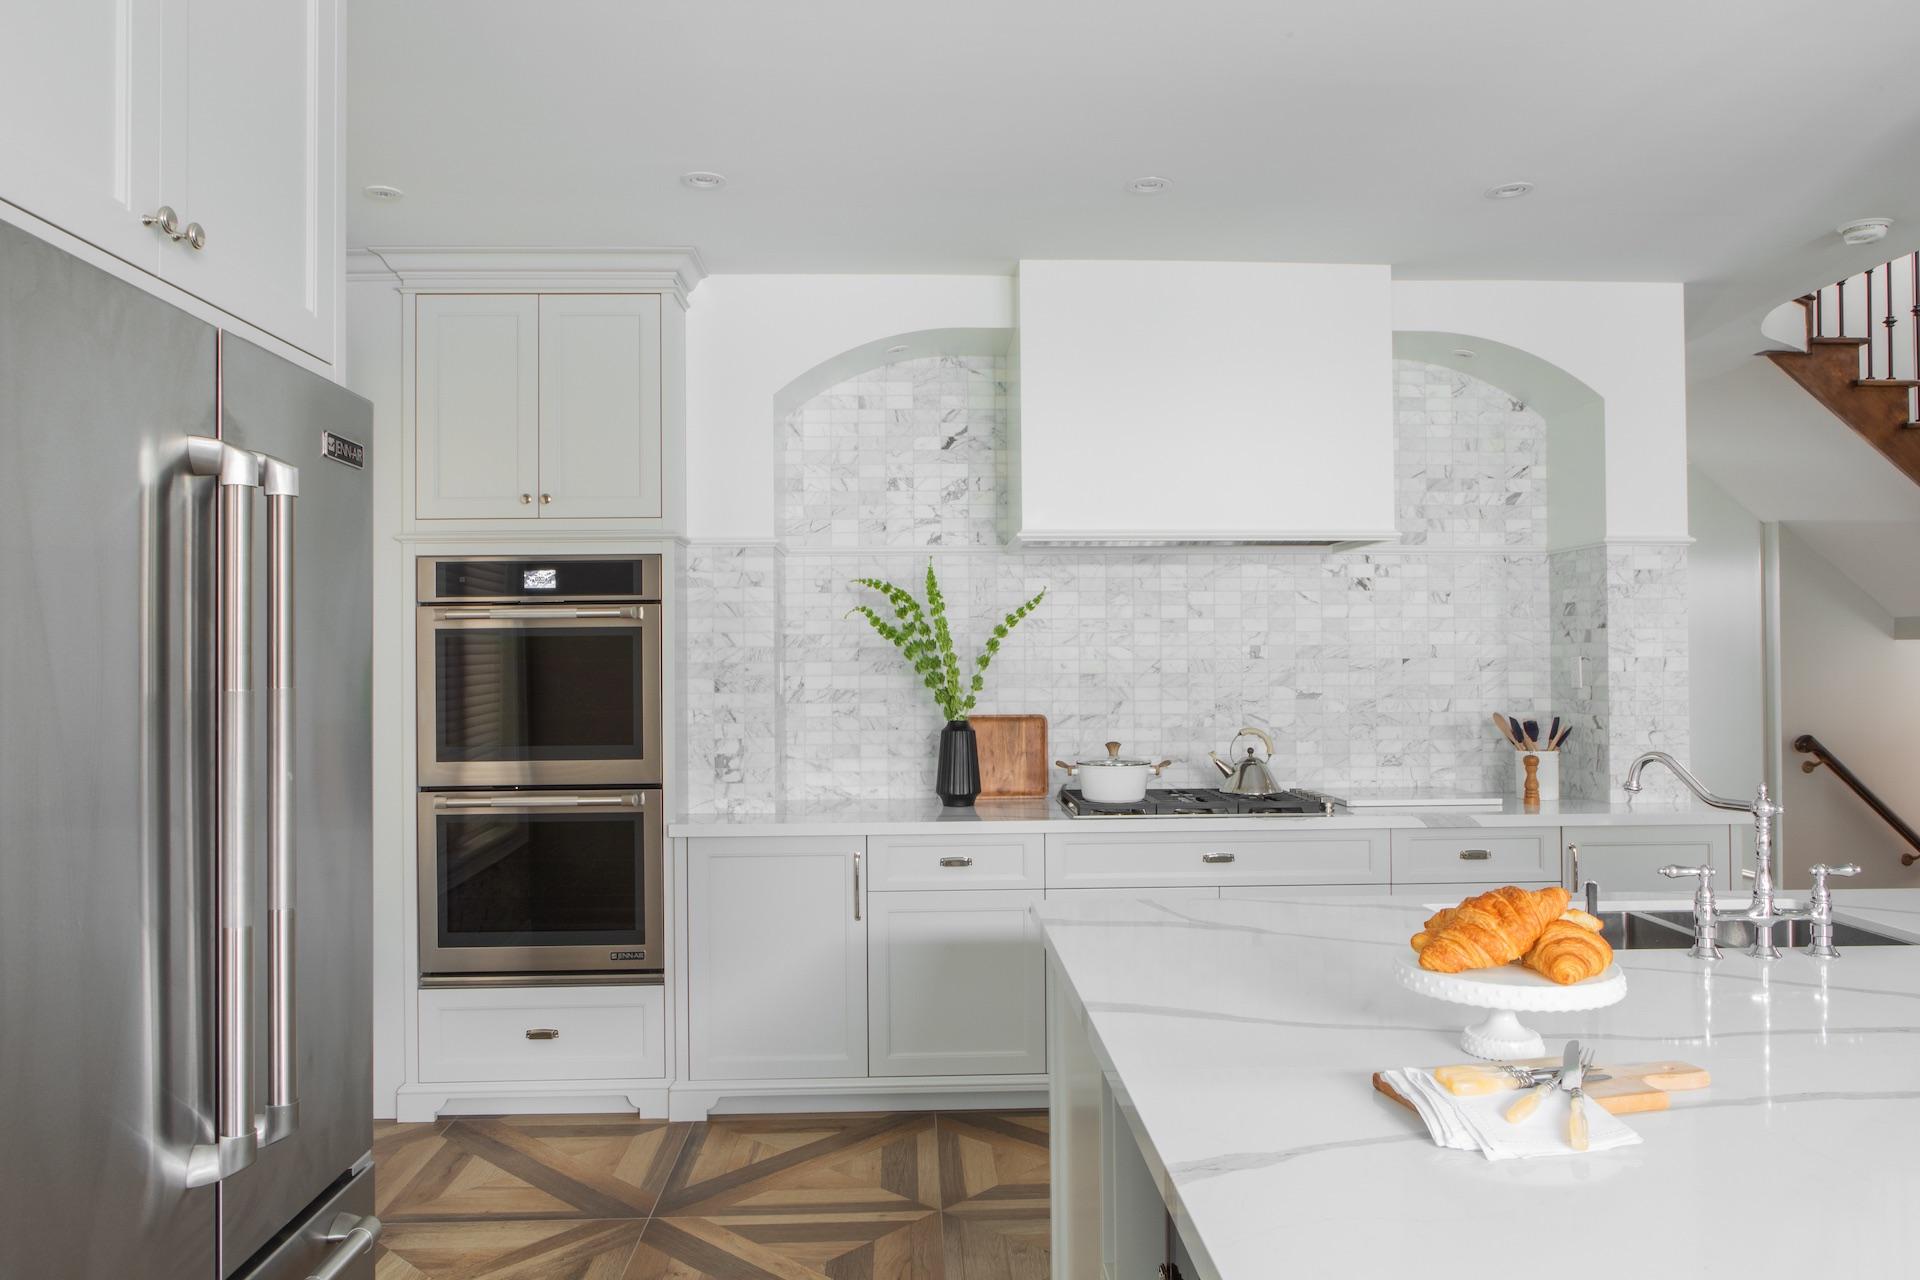 white kitchen with wood floor